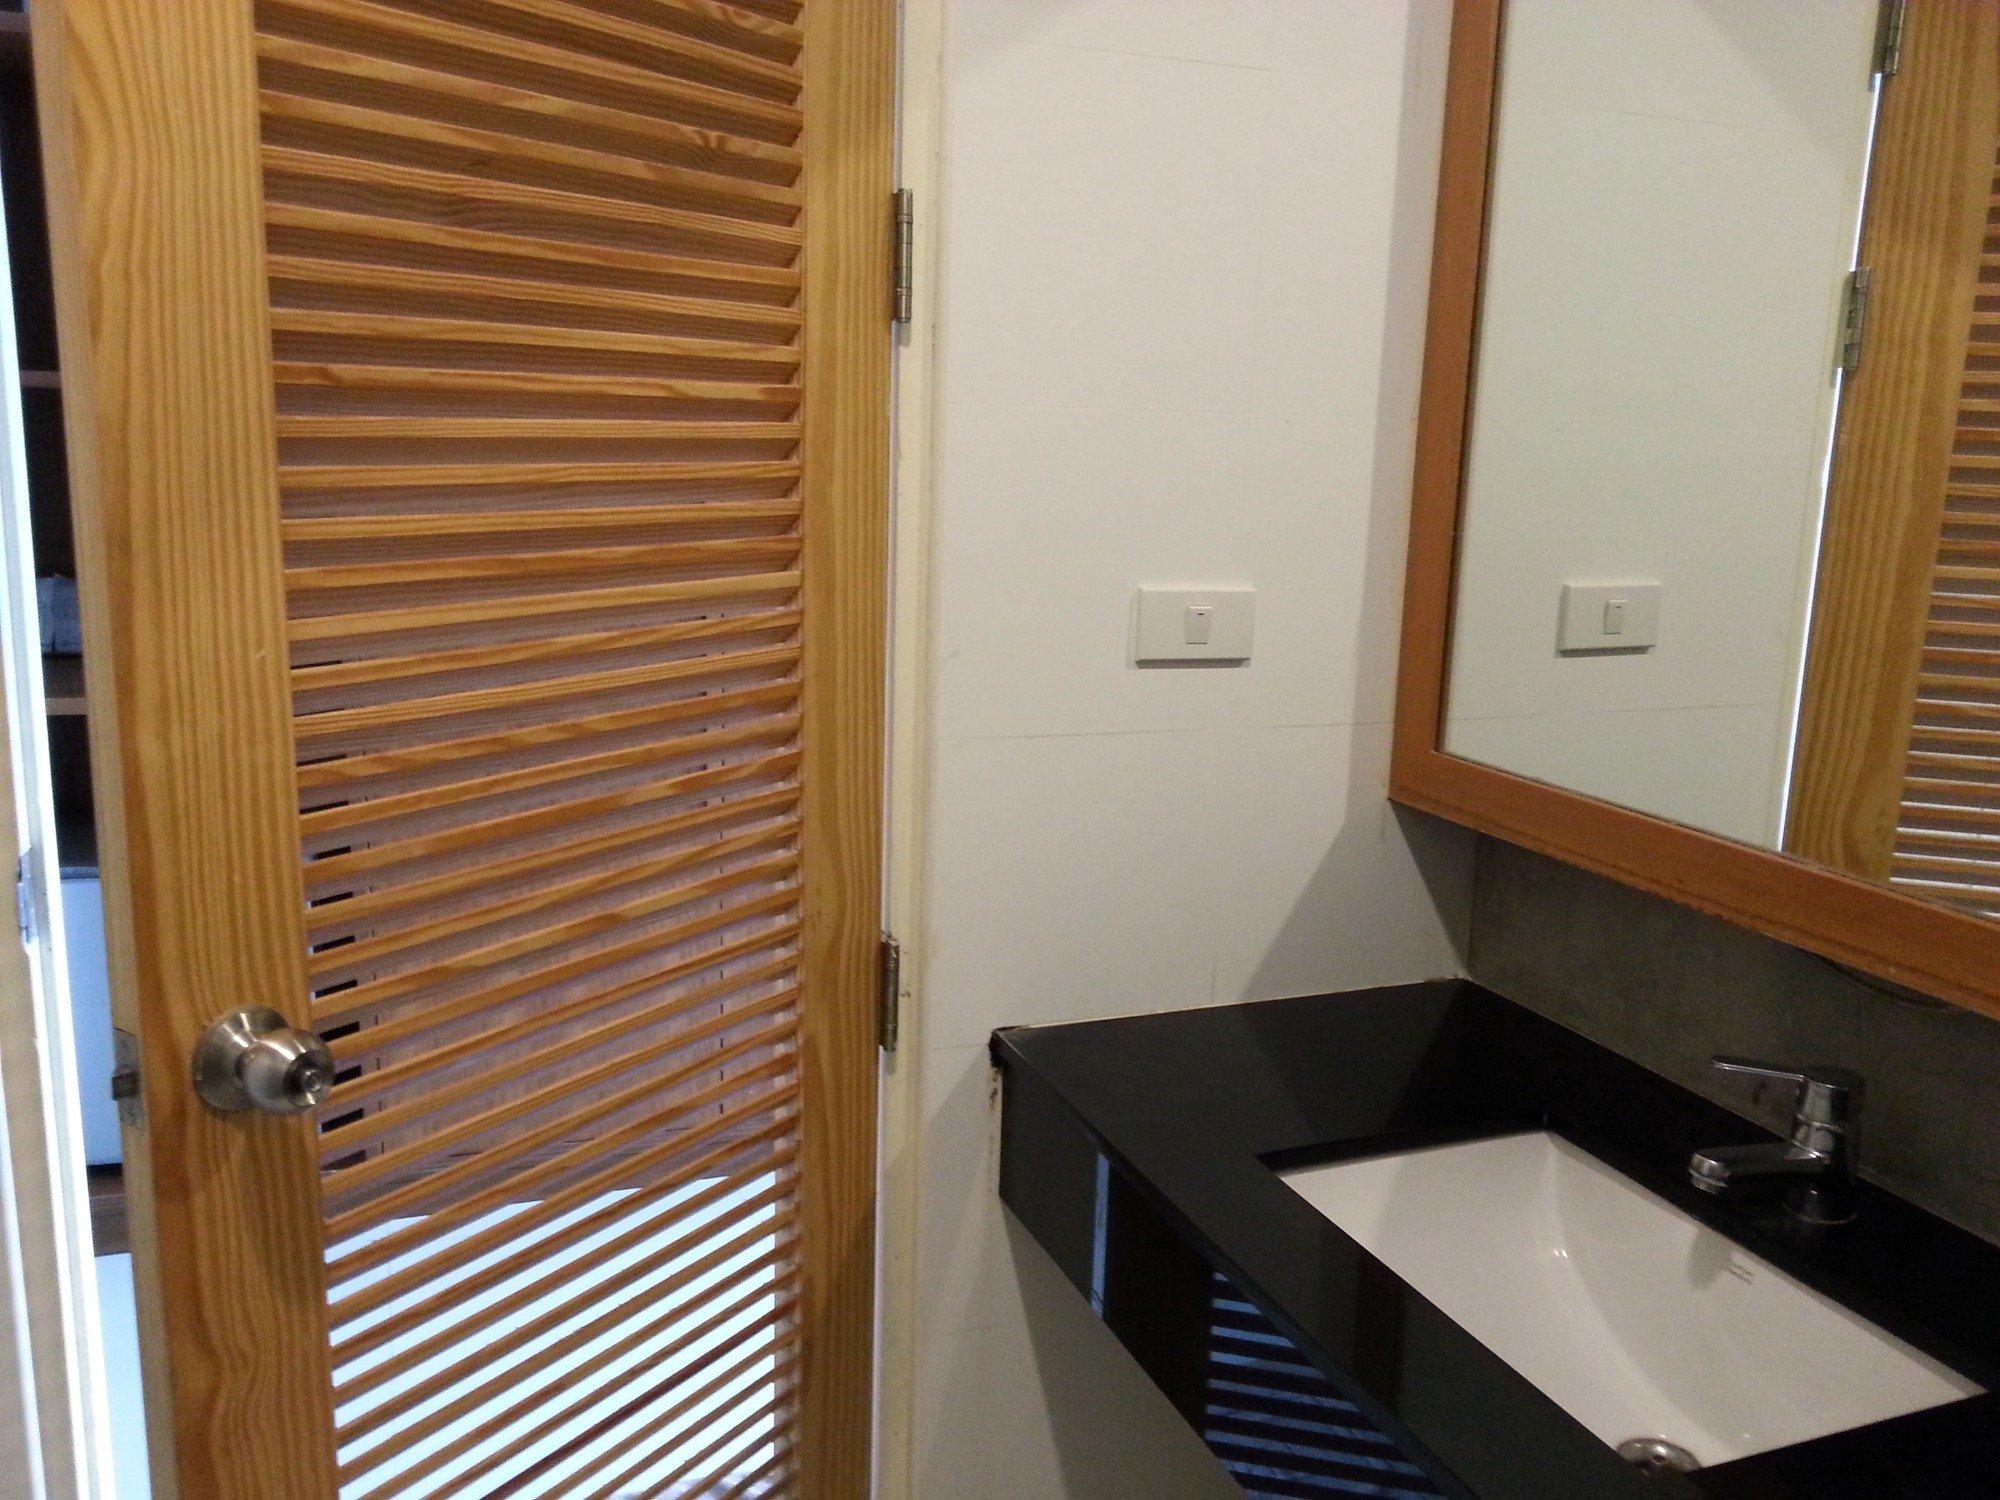 Bathroom at the Merdelong Hotel